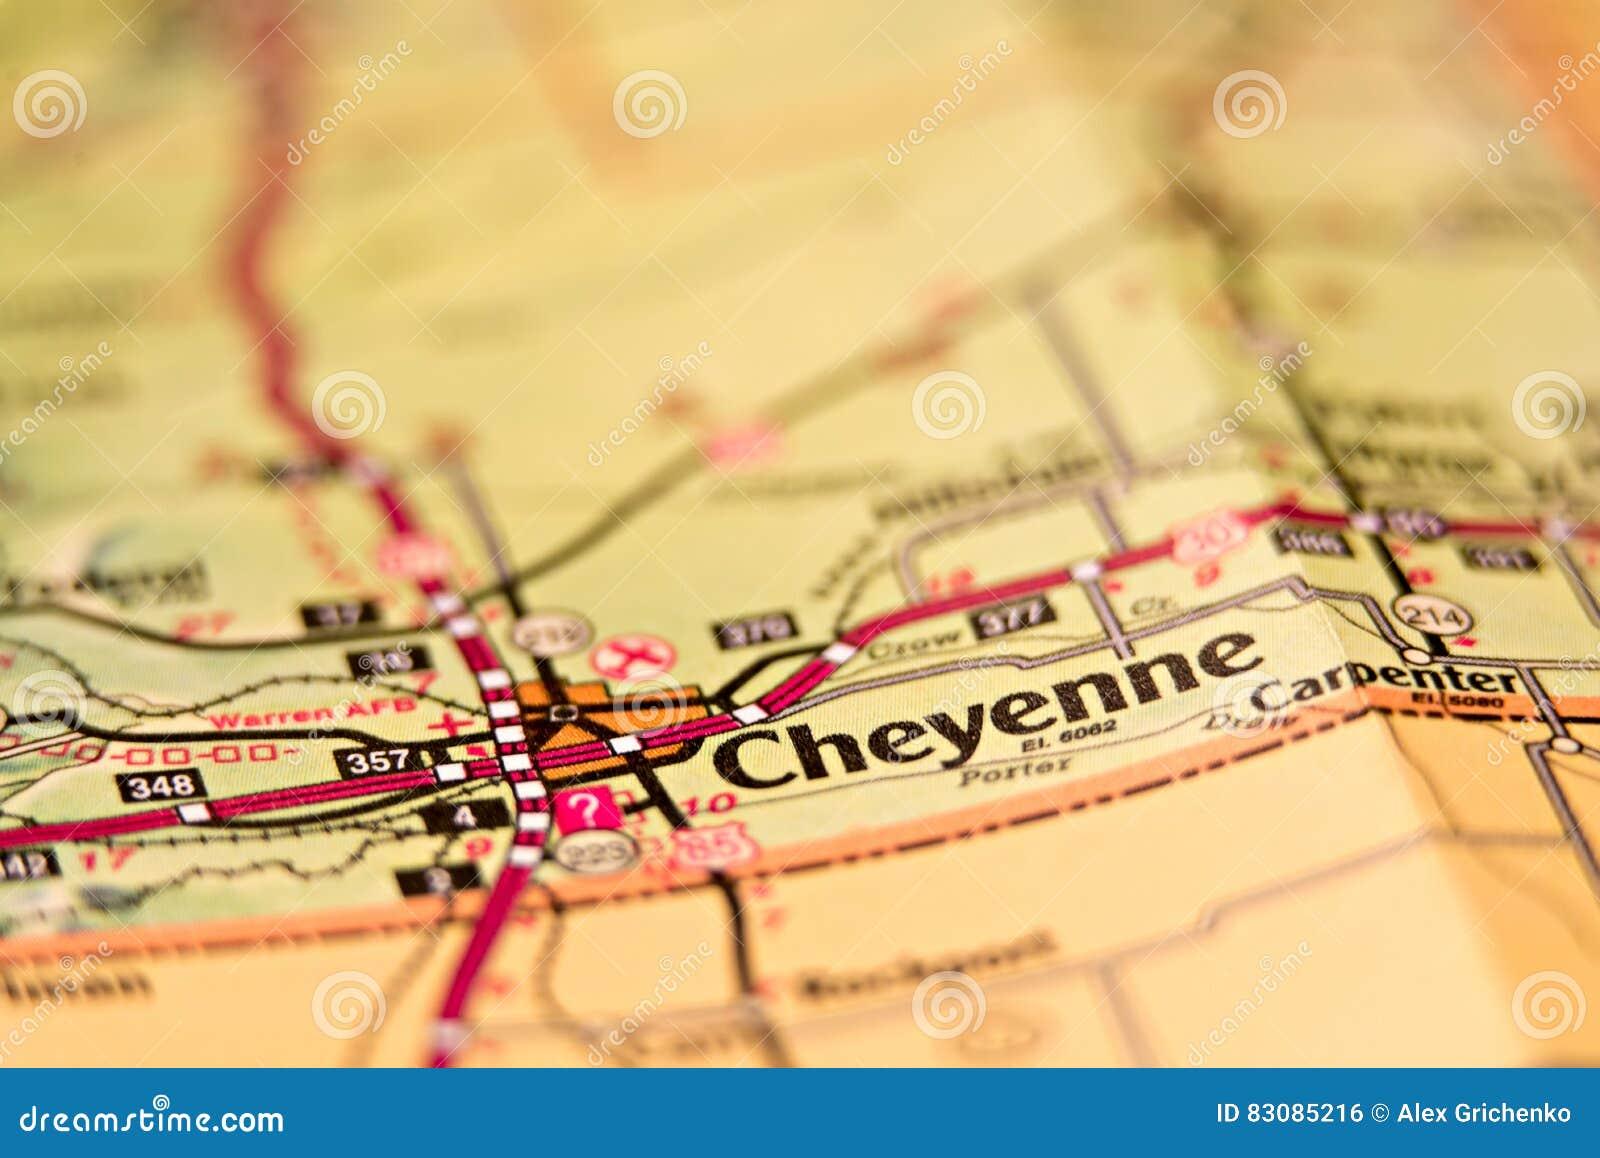 Cheyenne wyoming områdesöversikt